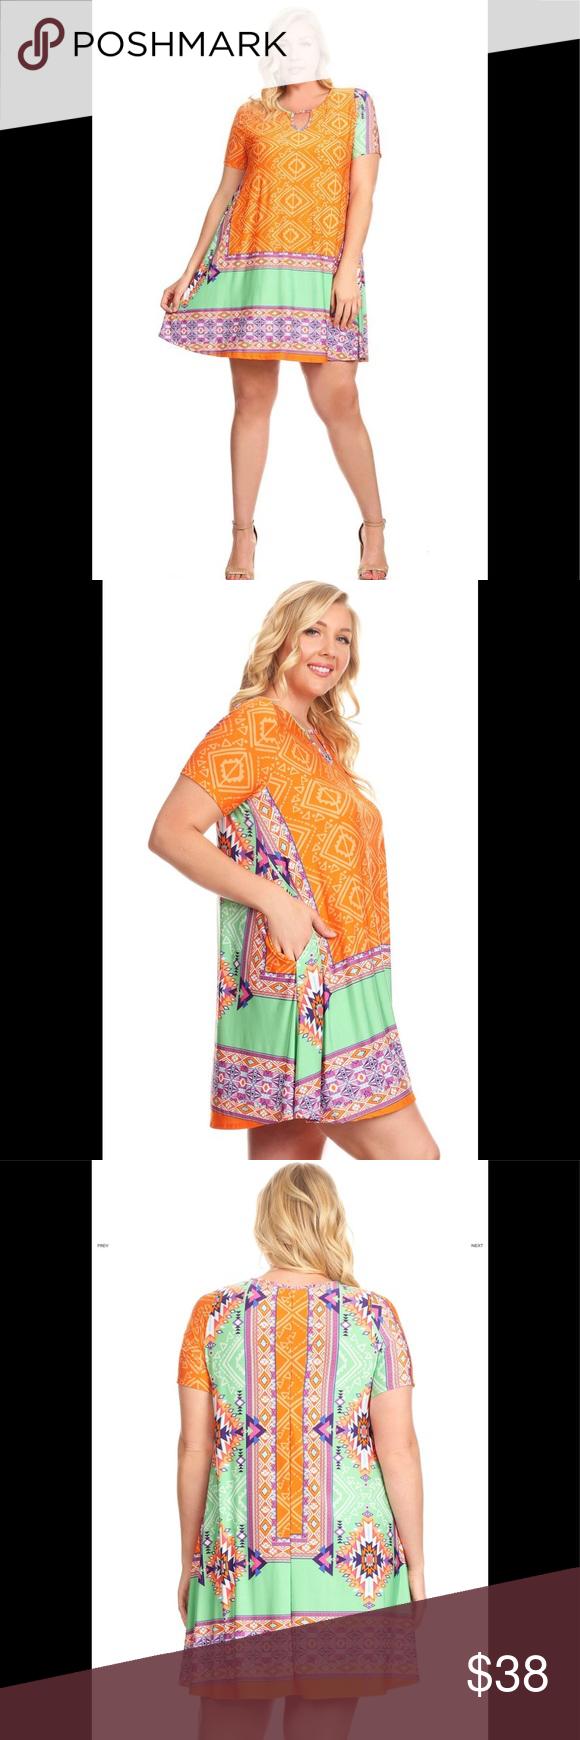 Multicolored border print fun summer dress boutique in my